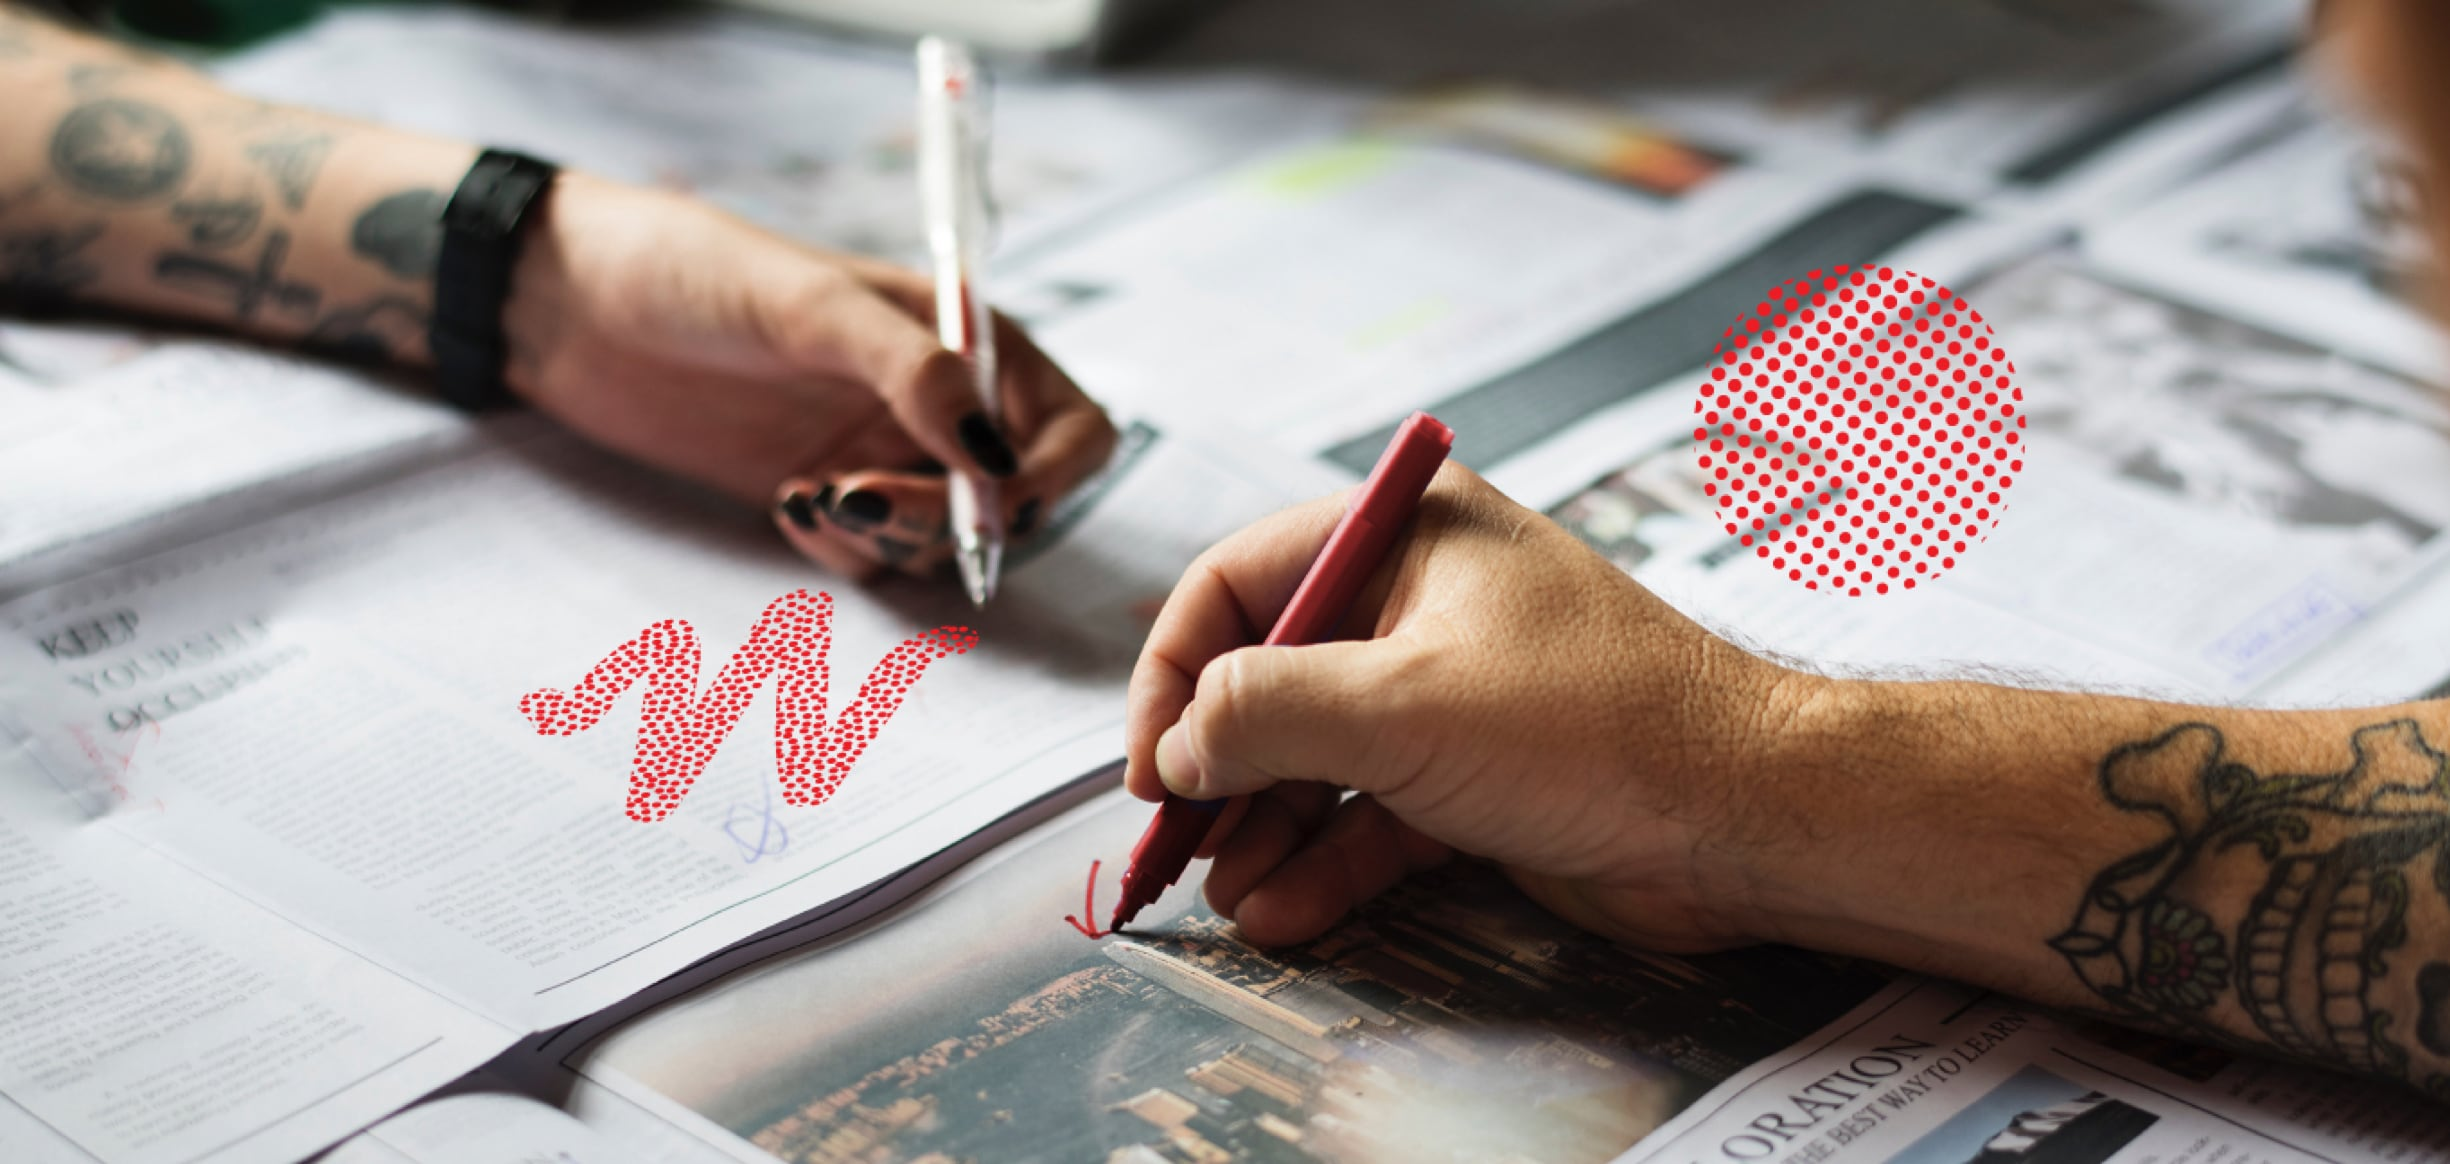 Copywriters & Designers: Who Leads?